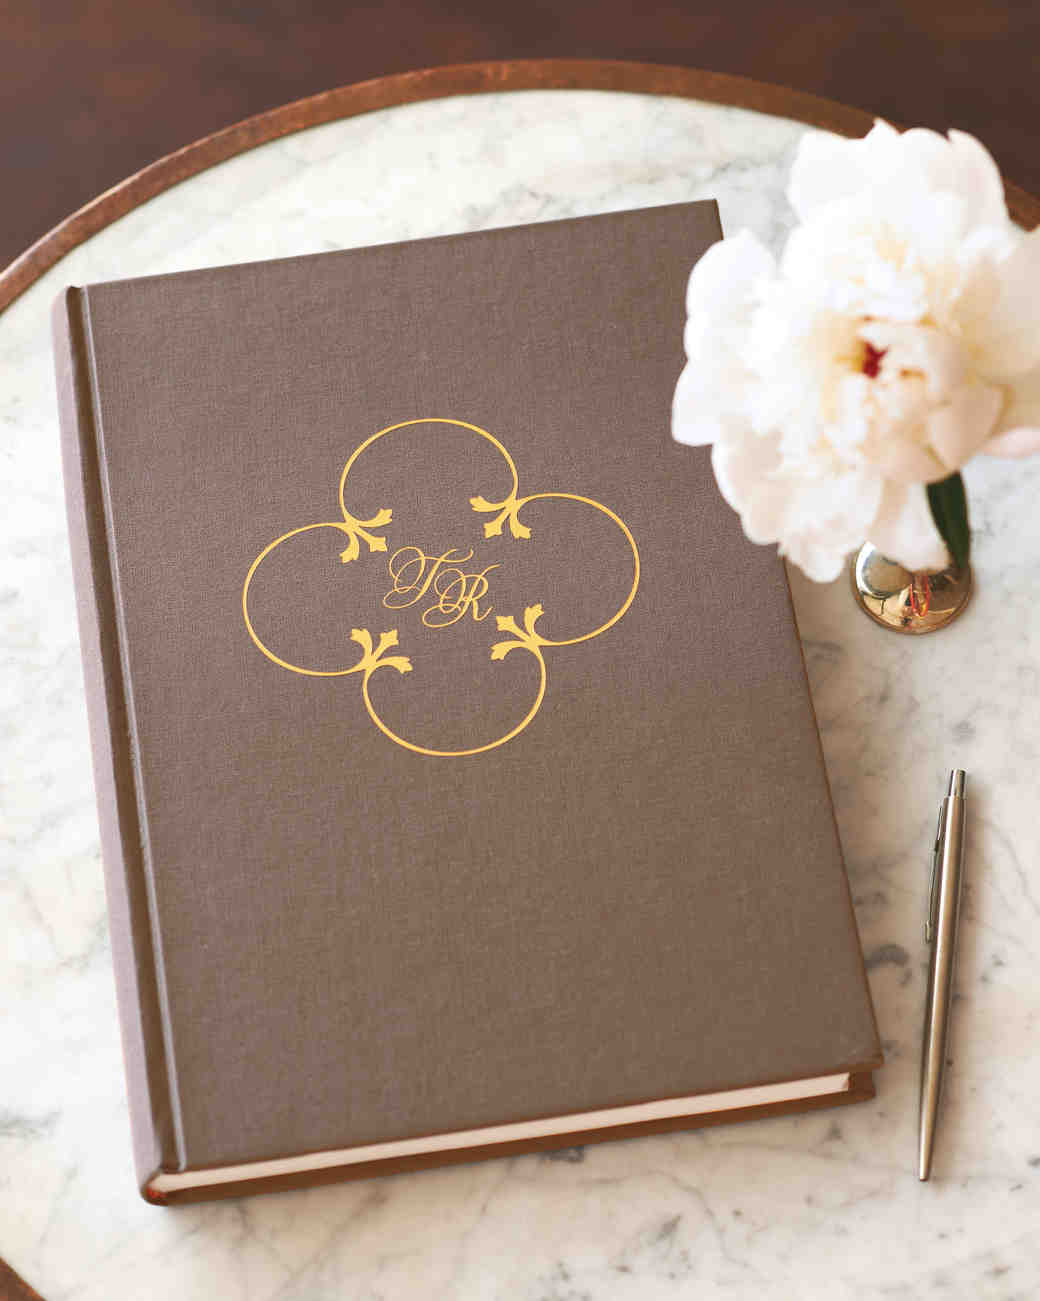 46 Guest Books from Real Weddings | Martha Stewart Weddings